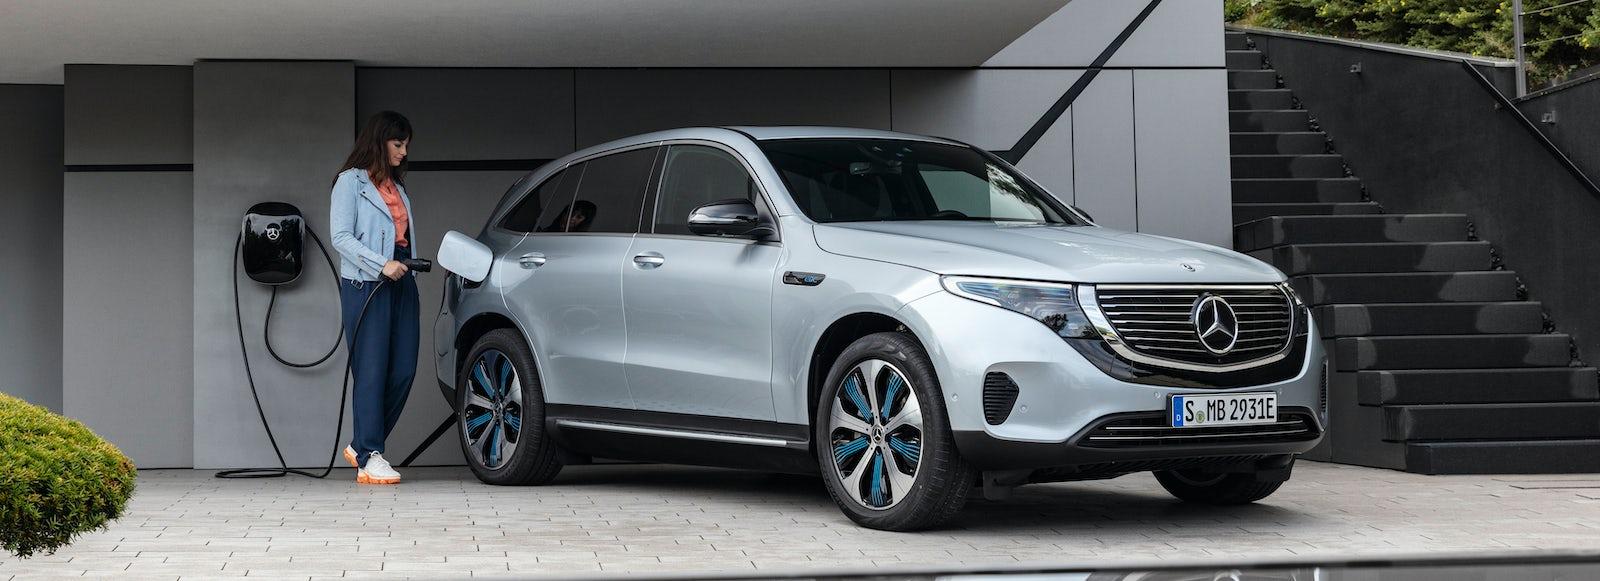 Mercedes Eqc Charging Ixlib Rb Fit Crop 60 Cs Tinysrgb Auto Format Eq Suv Price Specs Release Date